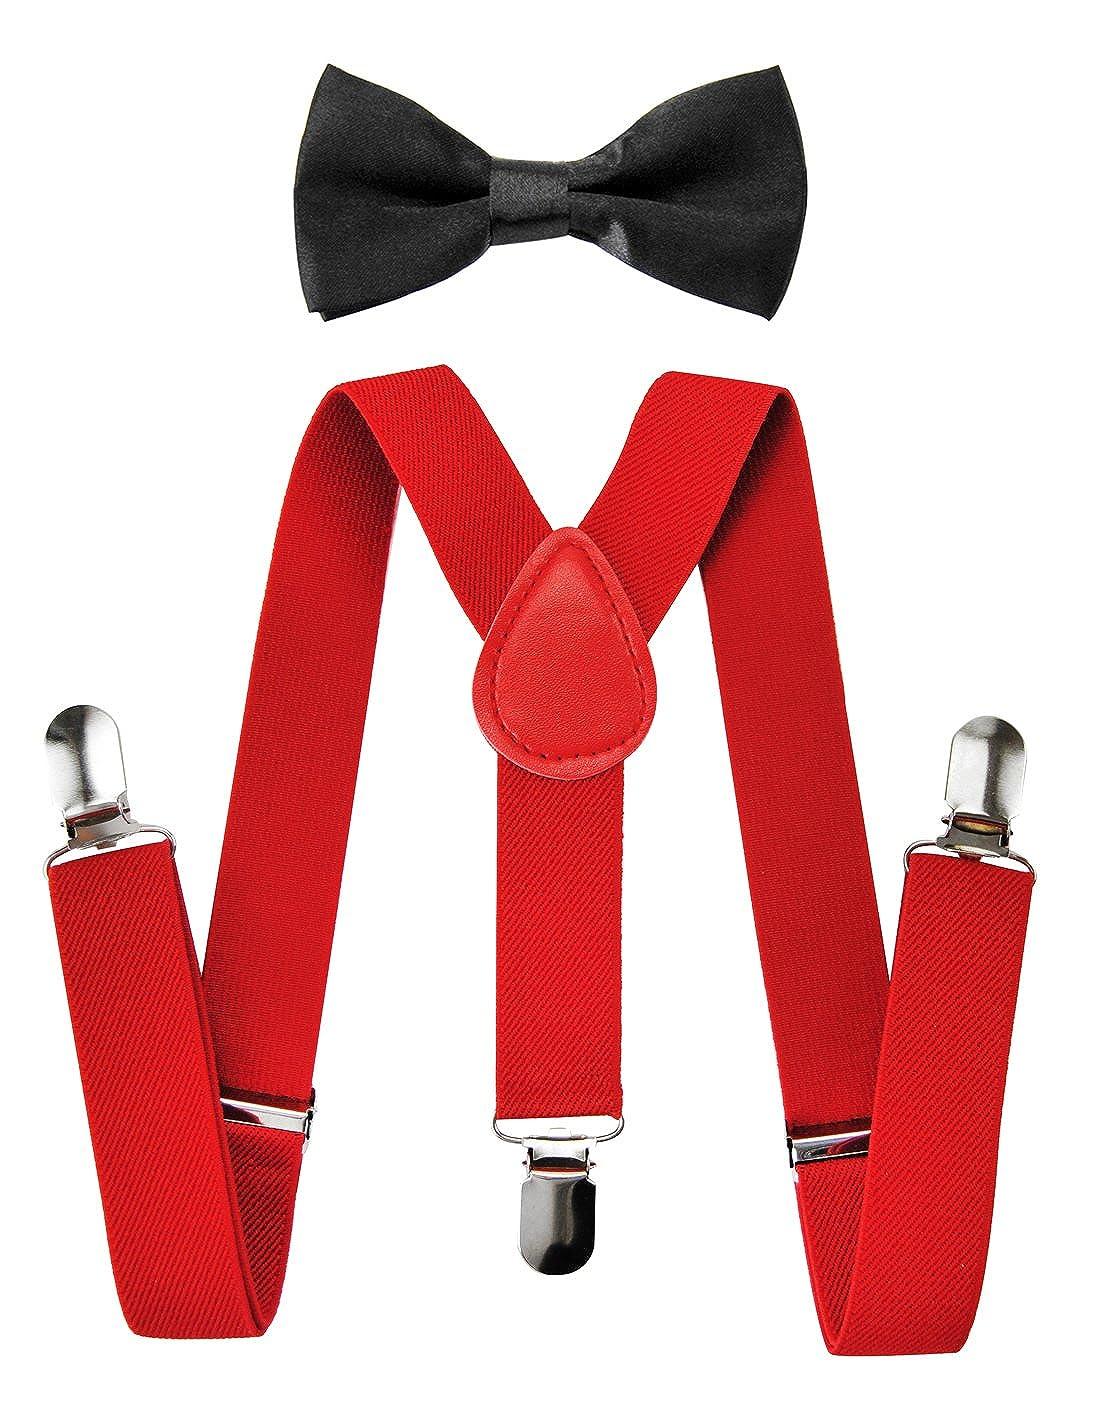 axy Kinder Rote Hosenträger-Y Form mit Fliege- 3 Clips EXTRA STARK HTKS25-ROT